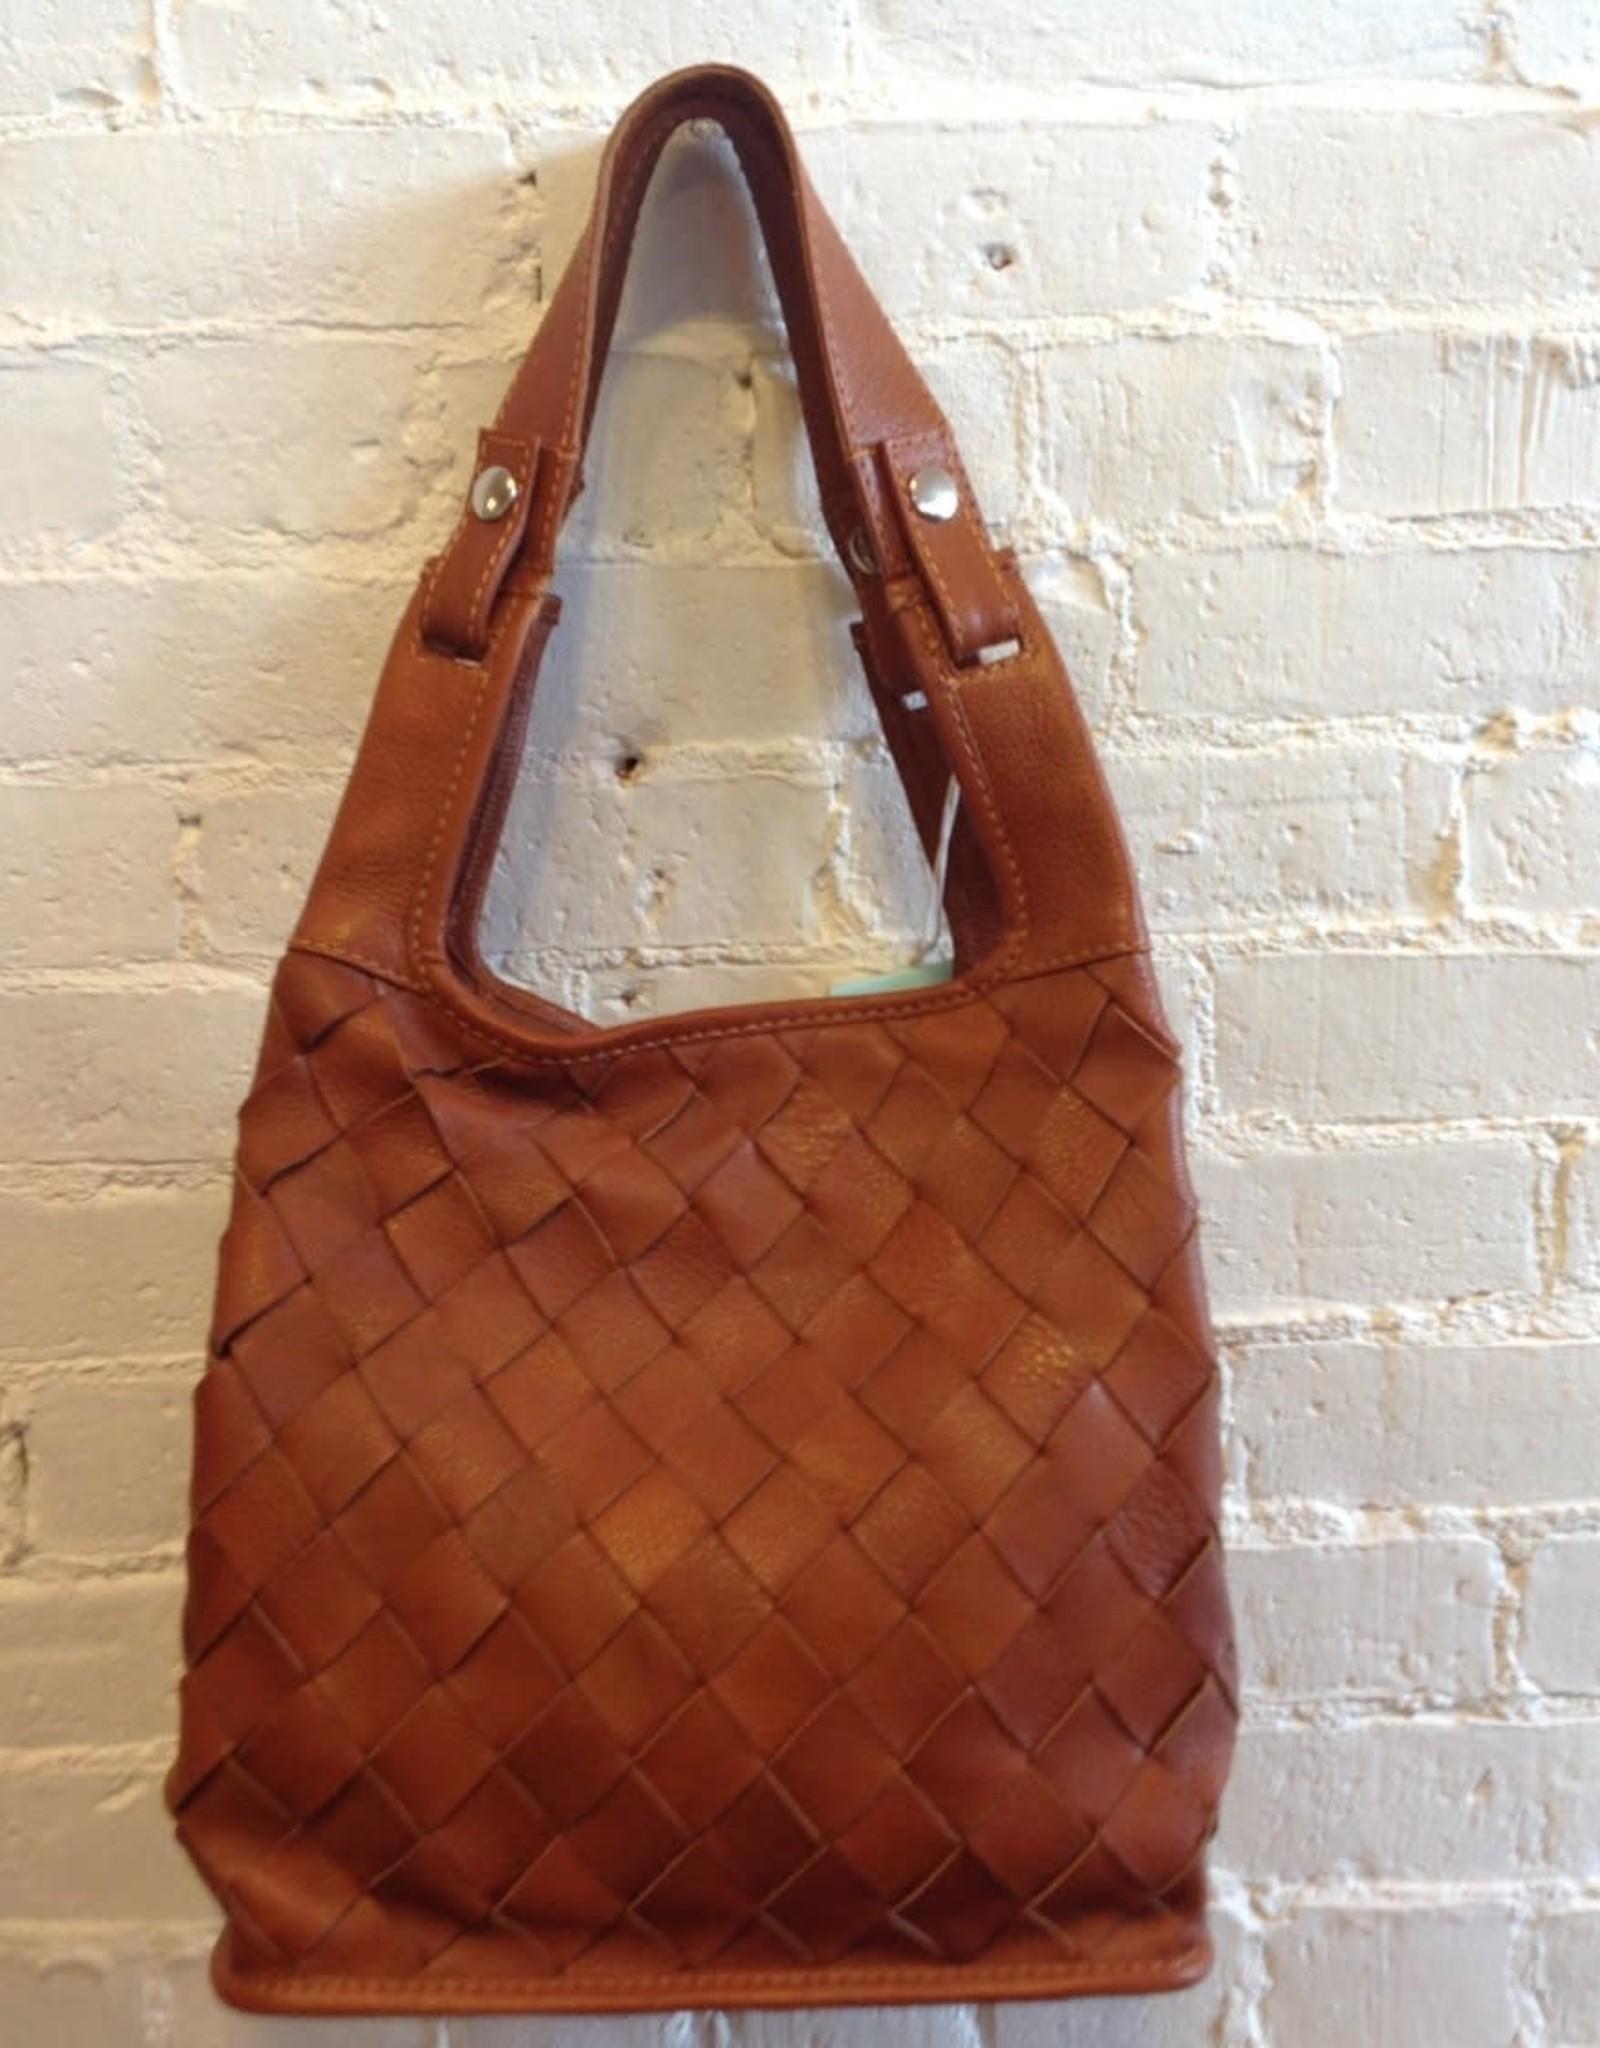 Lumi Woven Leather Market Bag